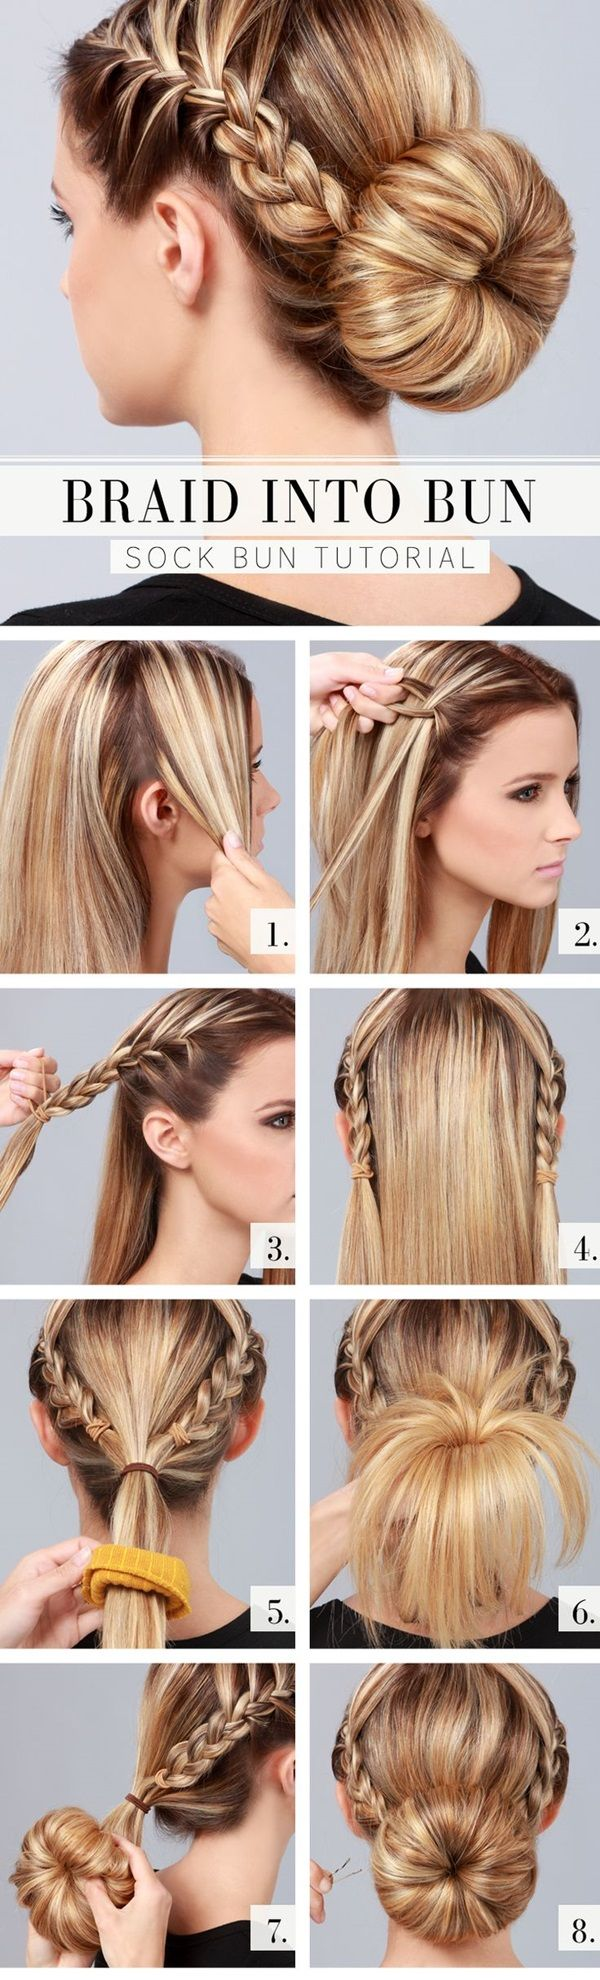 Astonishing 1000 Ideas About Diy Hairstyles On Pinterest Easy Diy Short Hairstyles For Black Women Fulllsitofus